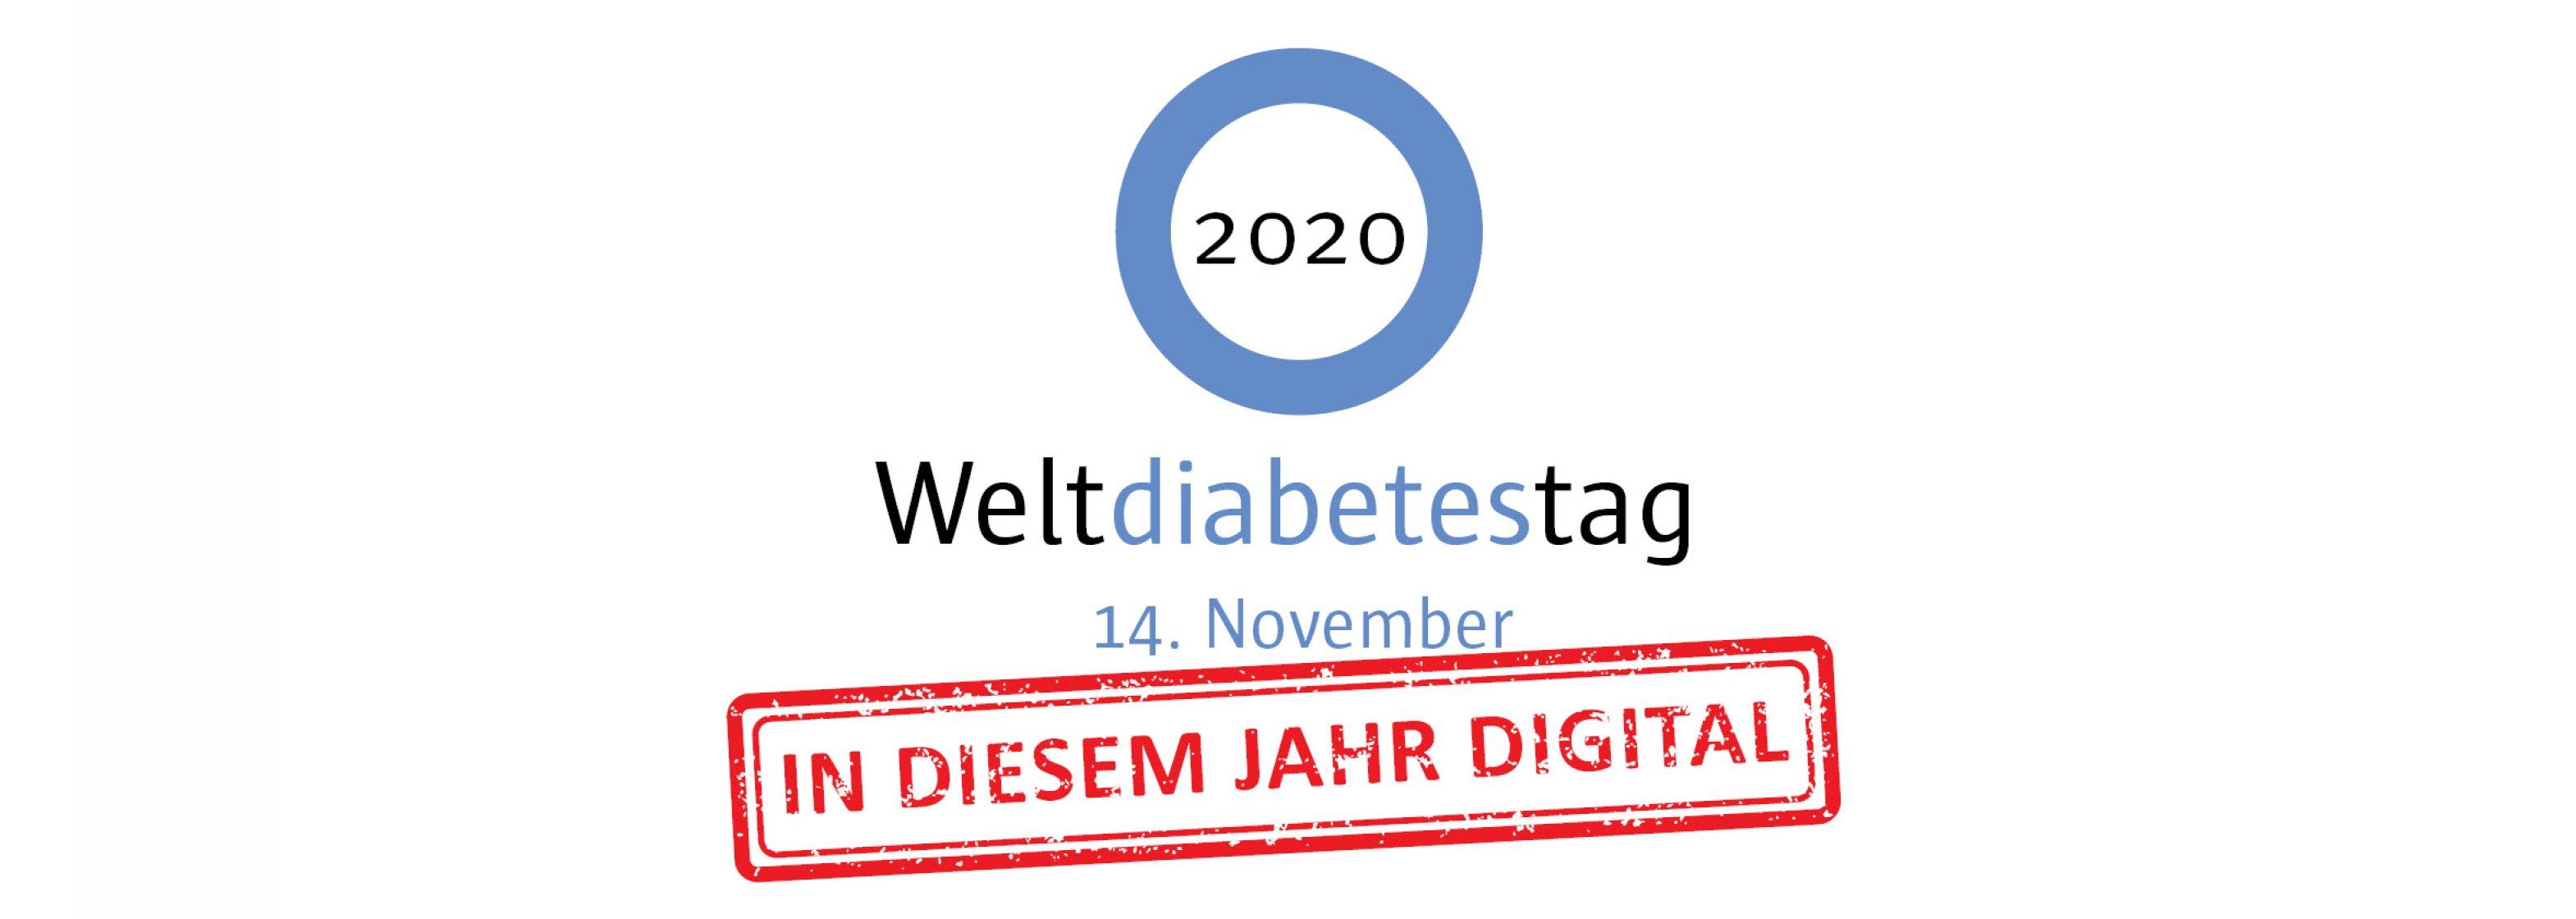 Logo Weltdiabetestag 2020 Hero-Bild